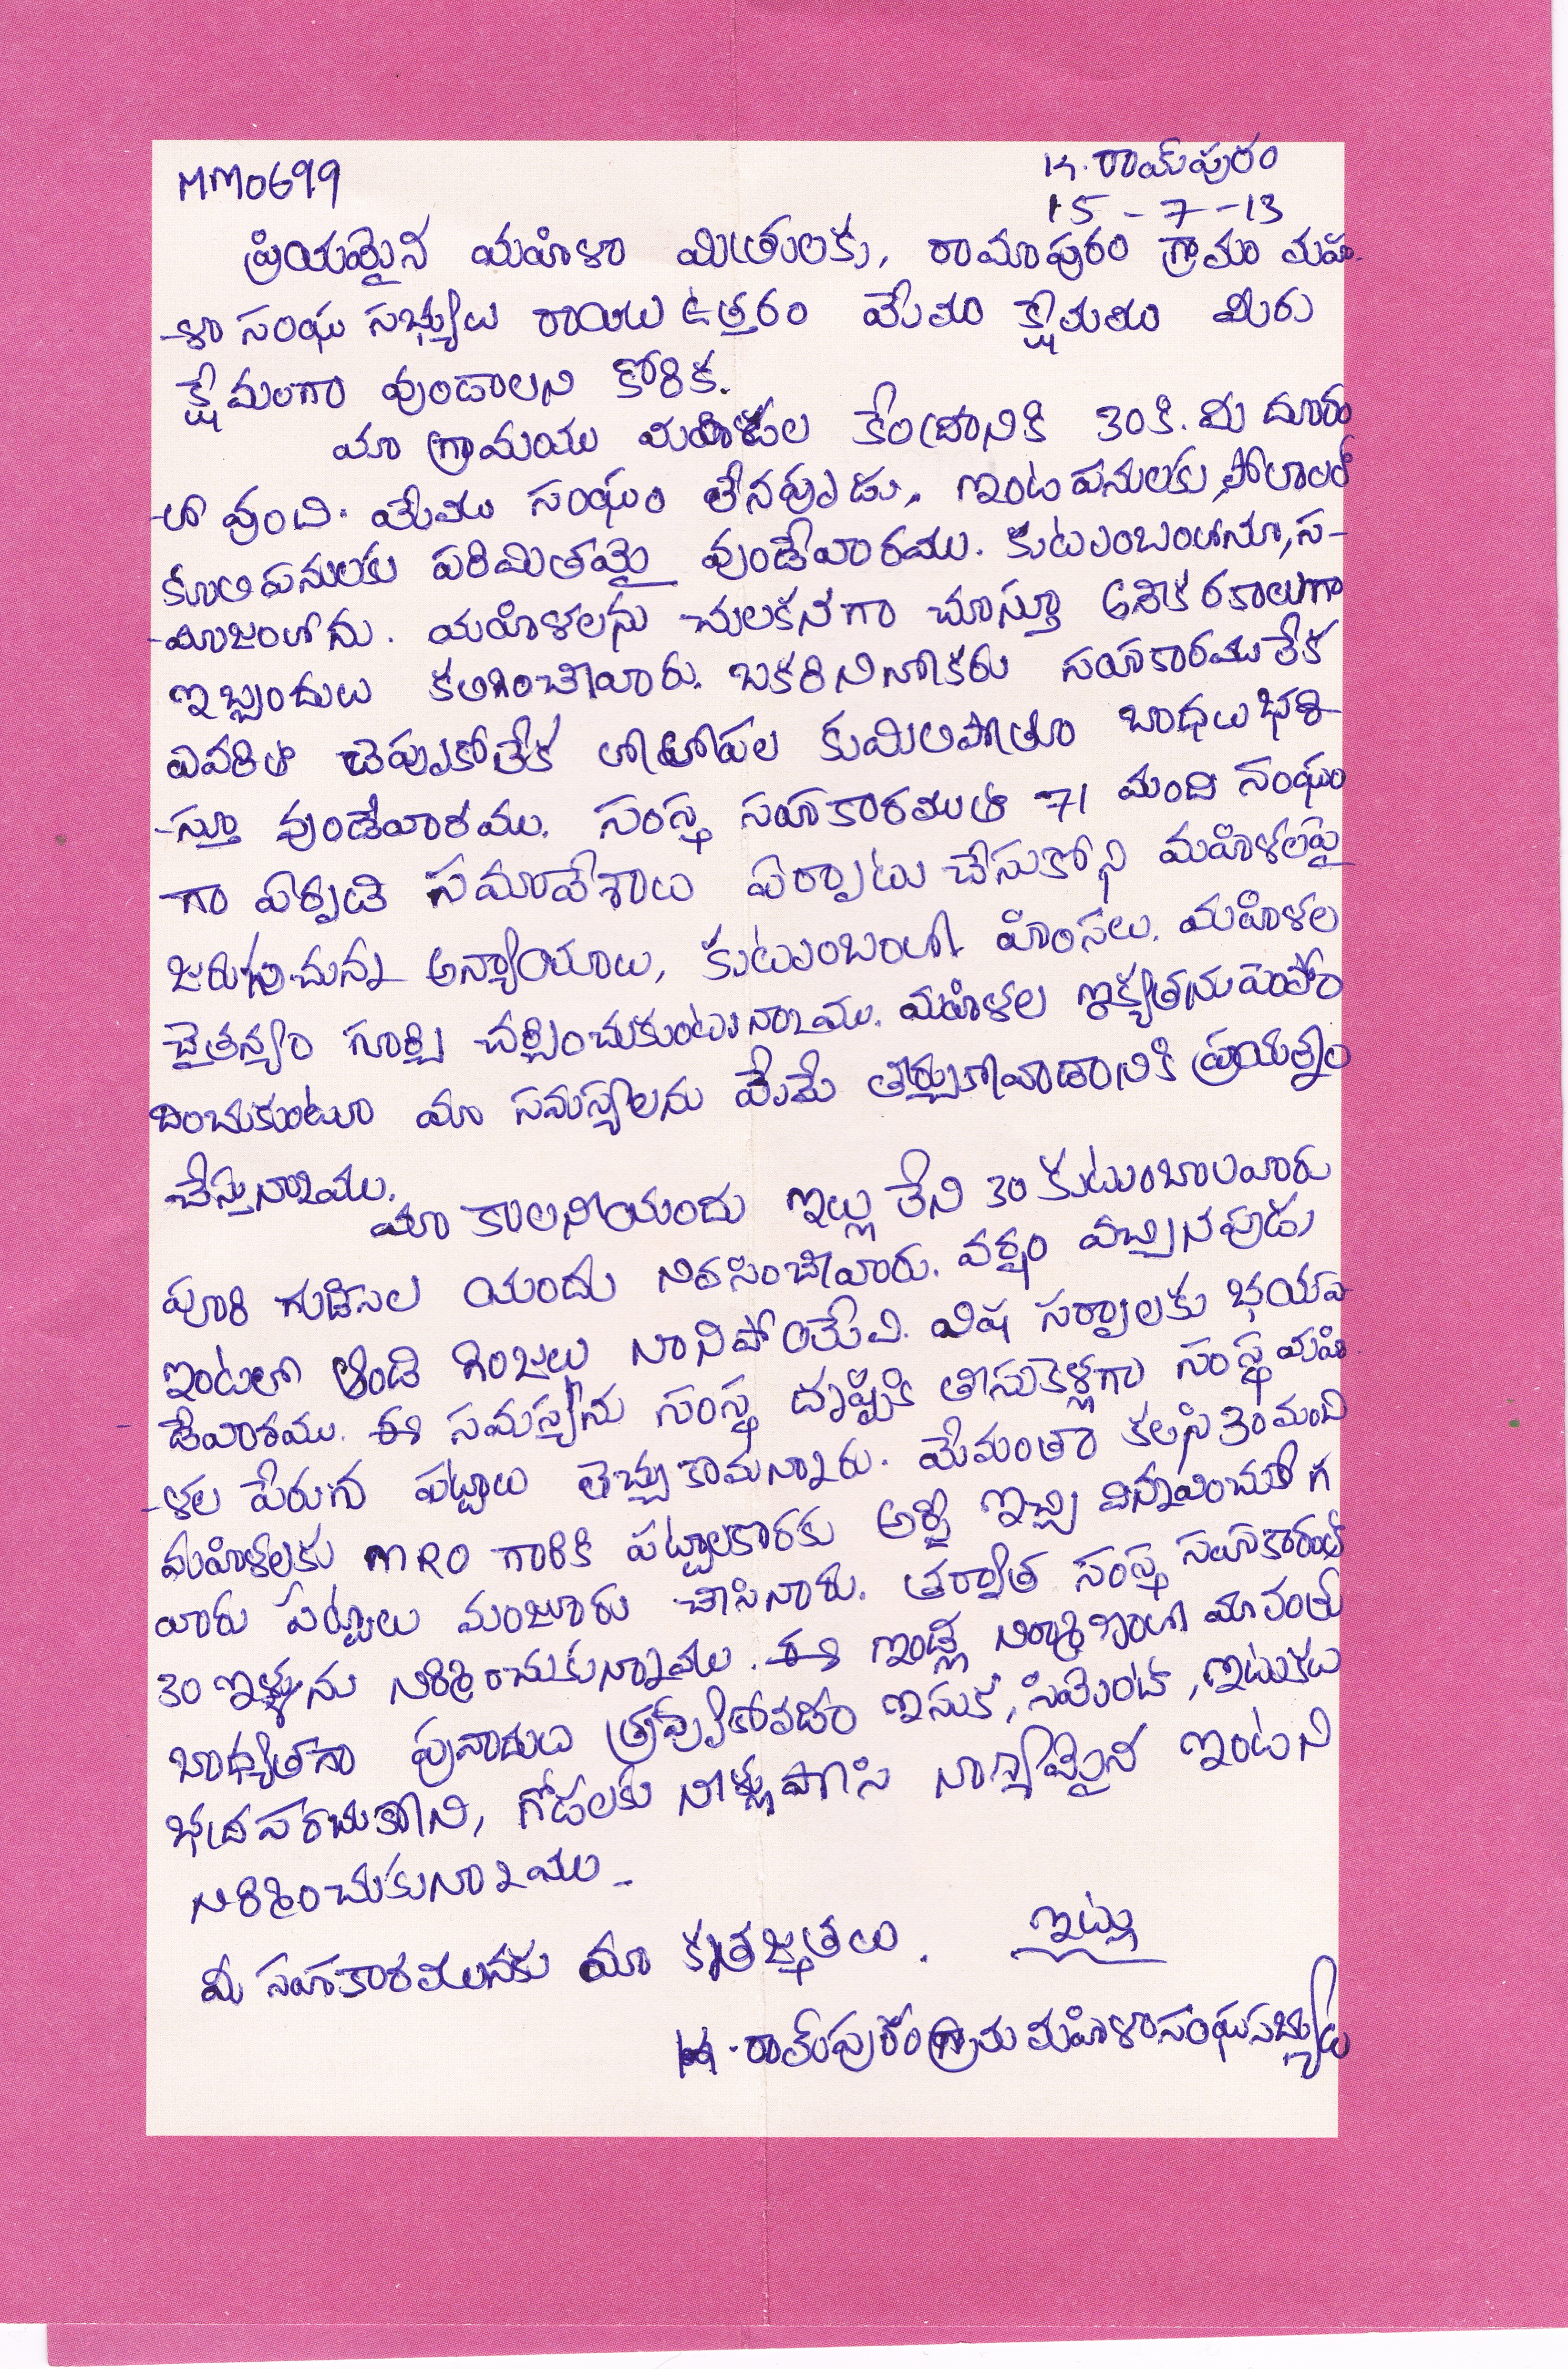 Carta del Shamga